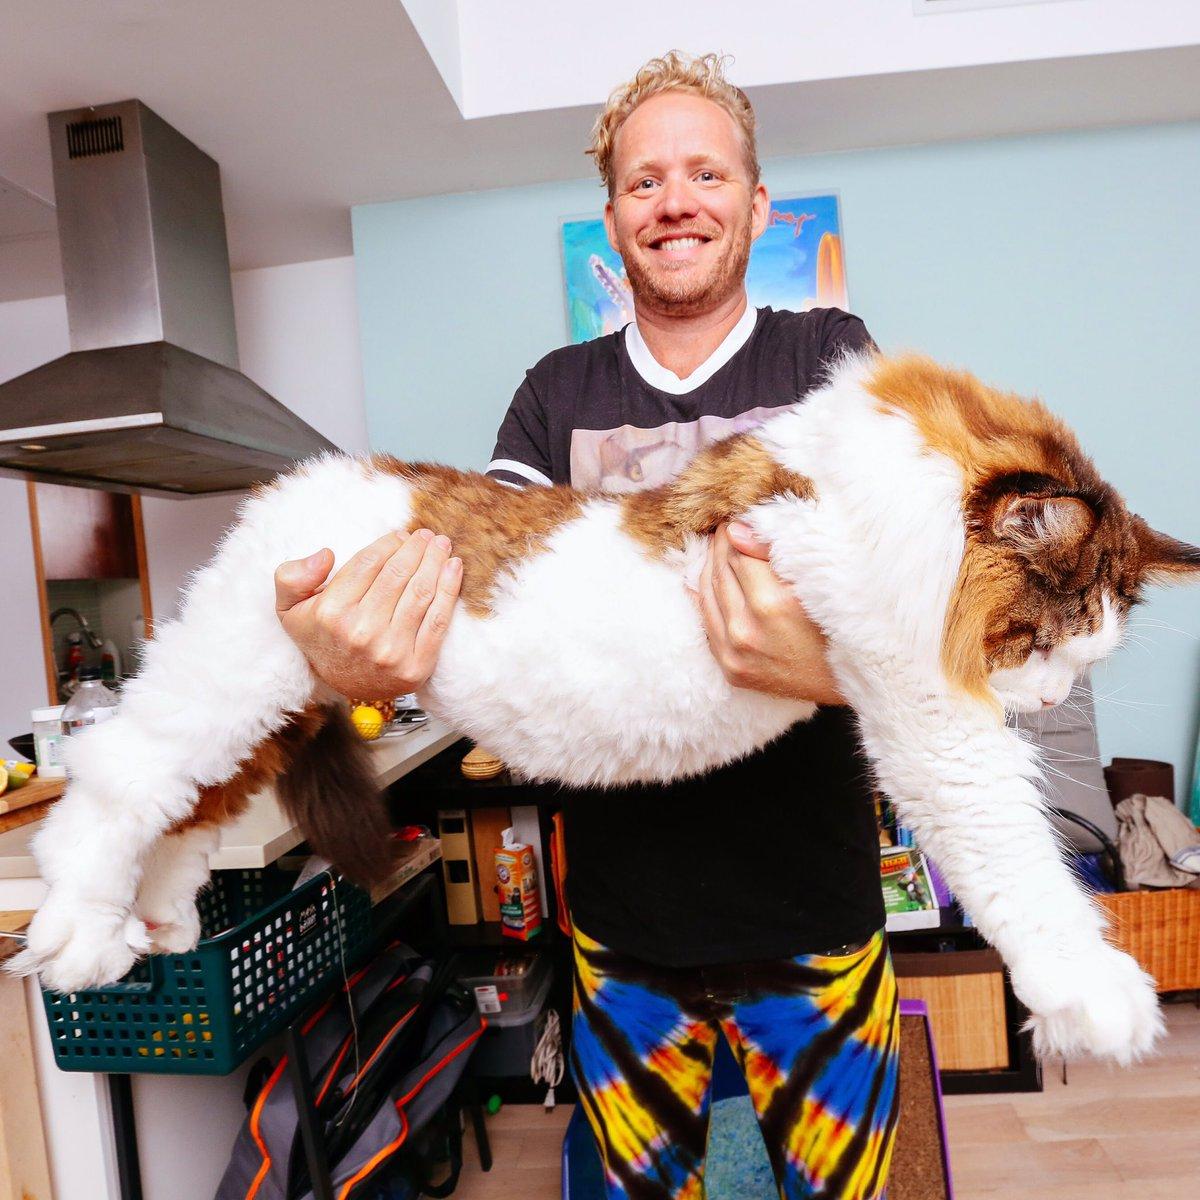 SAMSON THE CAT AKA CATSTRADAMUS - LARGEST CAT IN NYC!  #Catstradamus #Samson #SamsonCat #LargestCat https://t.co/HxAdmHBPsf